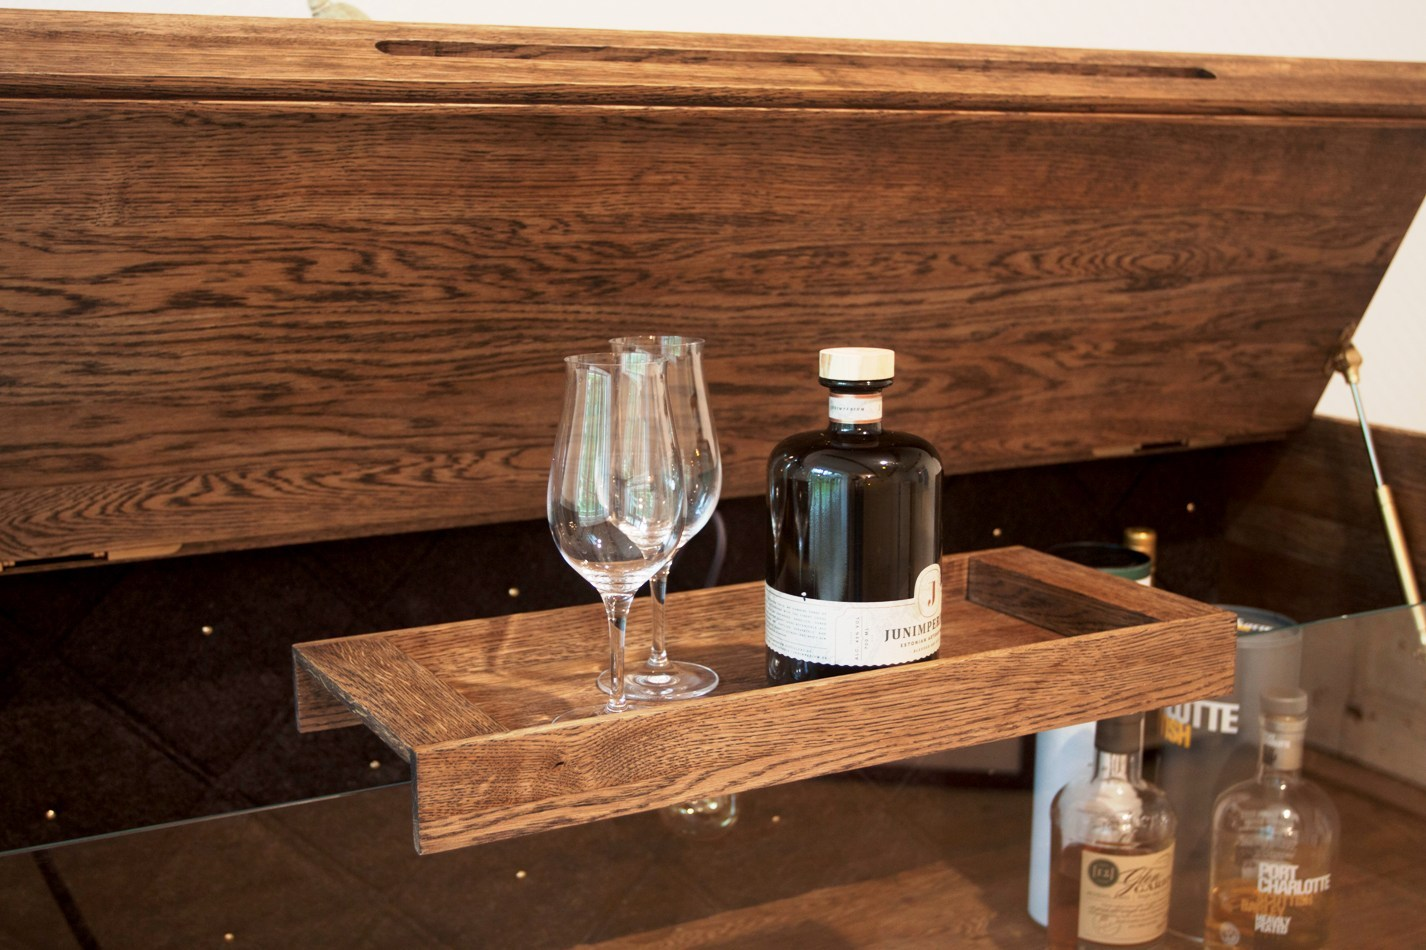 bar-cabinet-minibar-home-bar-sideboard-buffet-baarikapp-whiskey-bar-cabinet-mid-century-19_9585